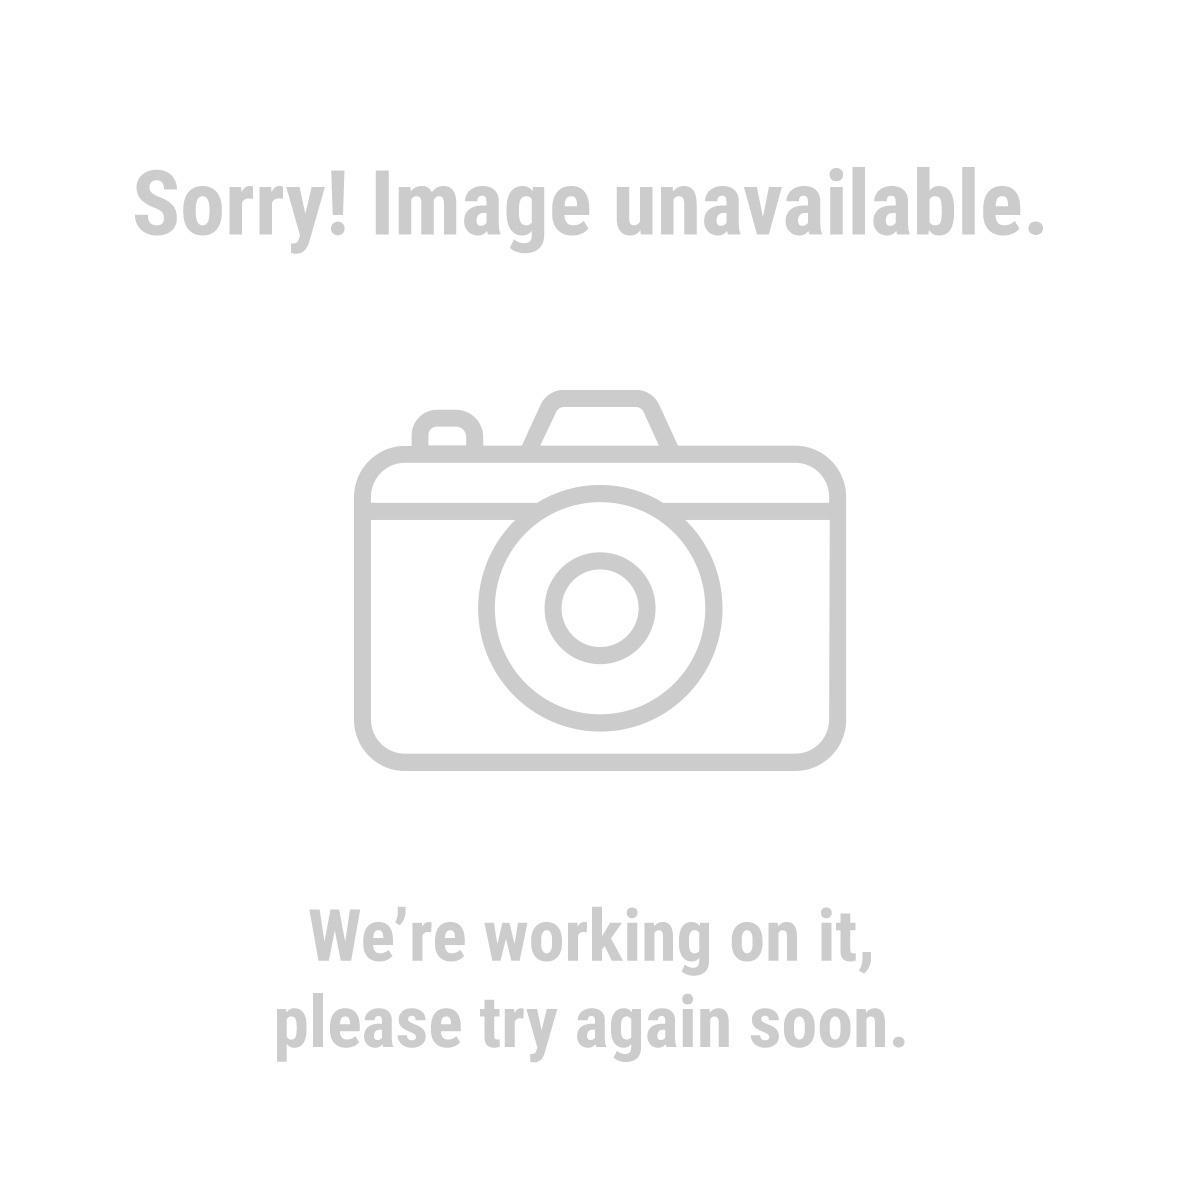 Haul-Master® 2211 3 Ton Chain Hoist